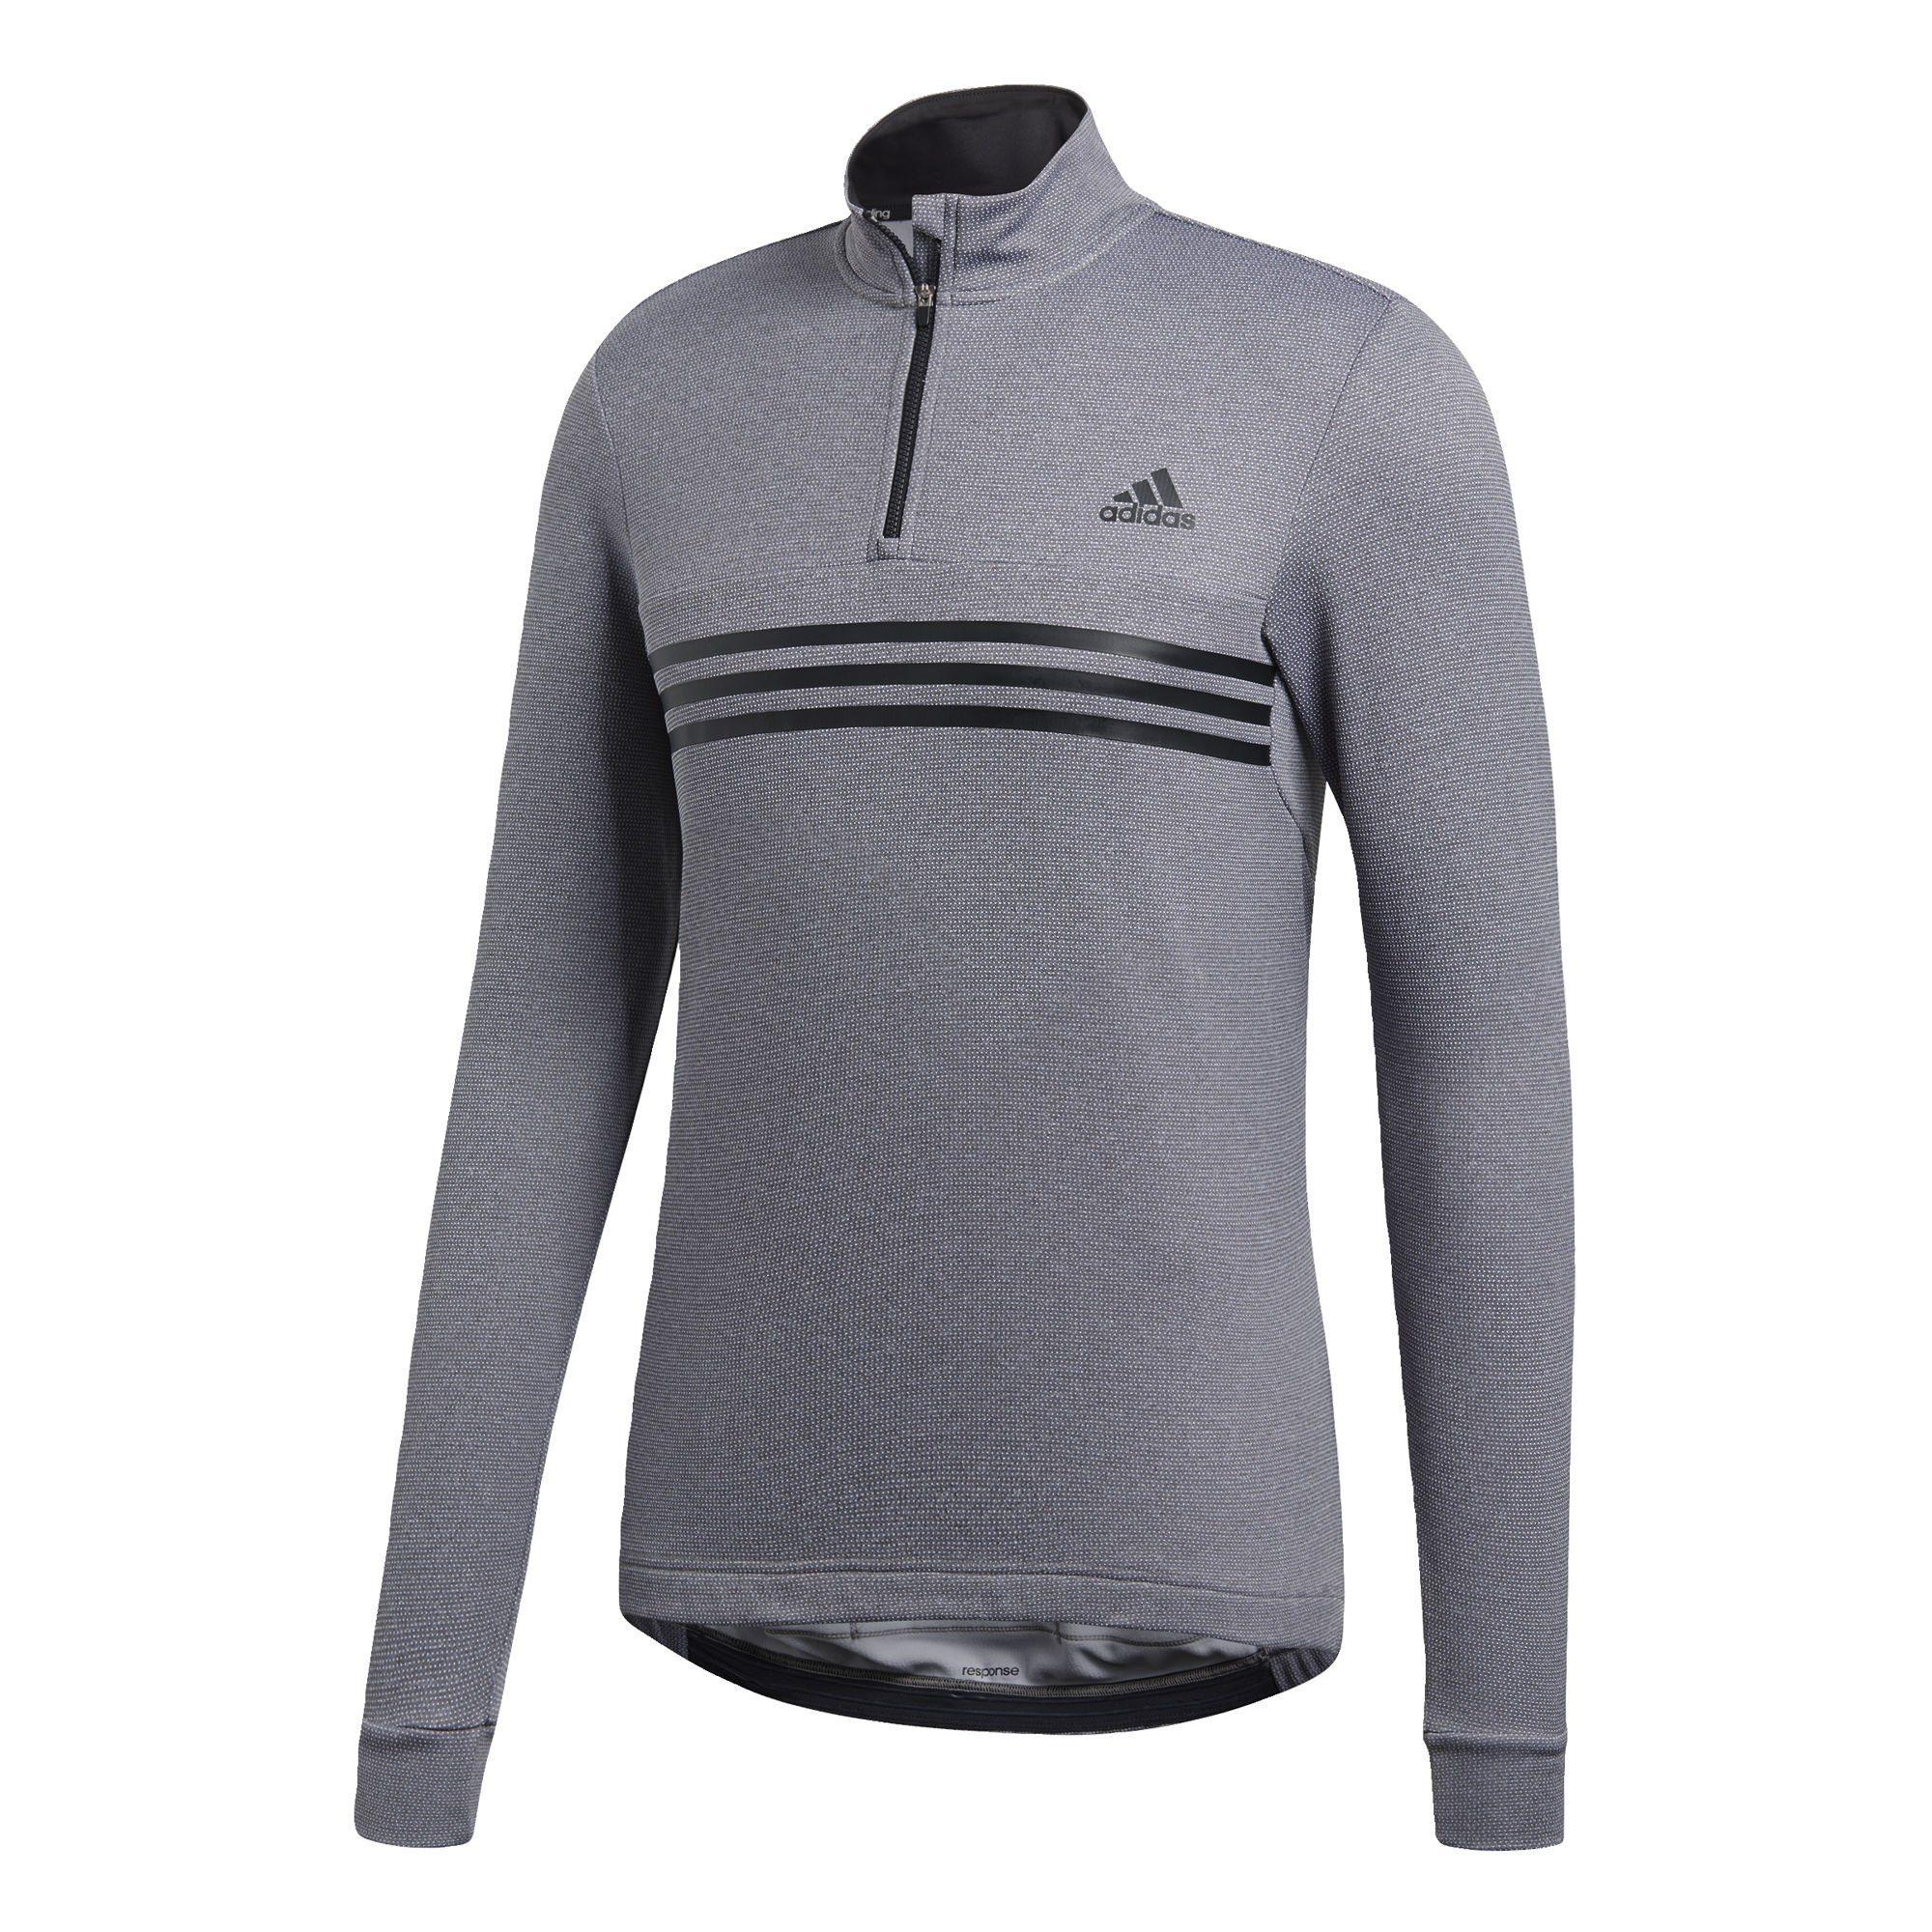 adidas Performance Langarmshirt »Warmtefront Trikot« online kaufen   OTTO